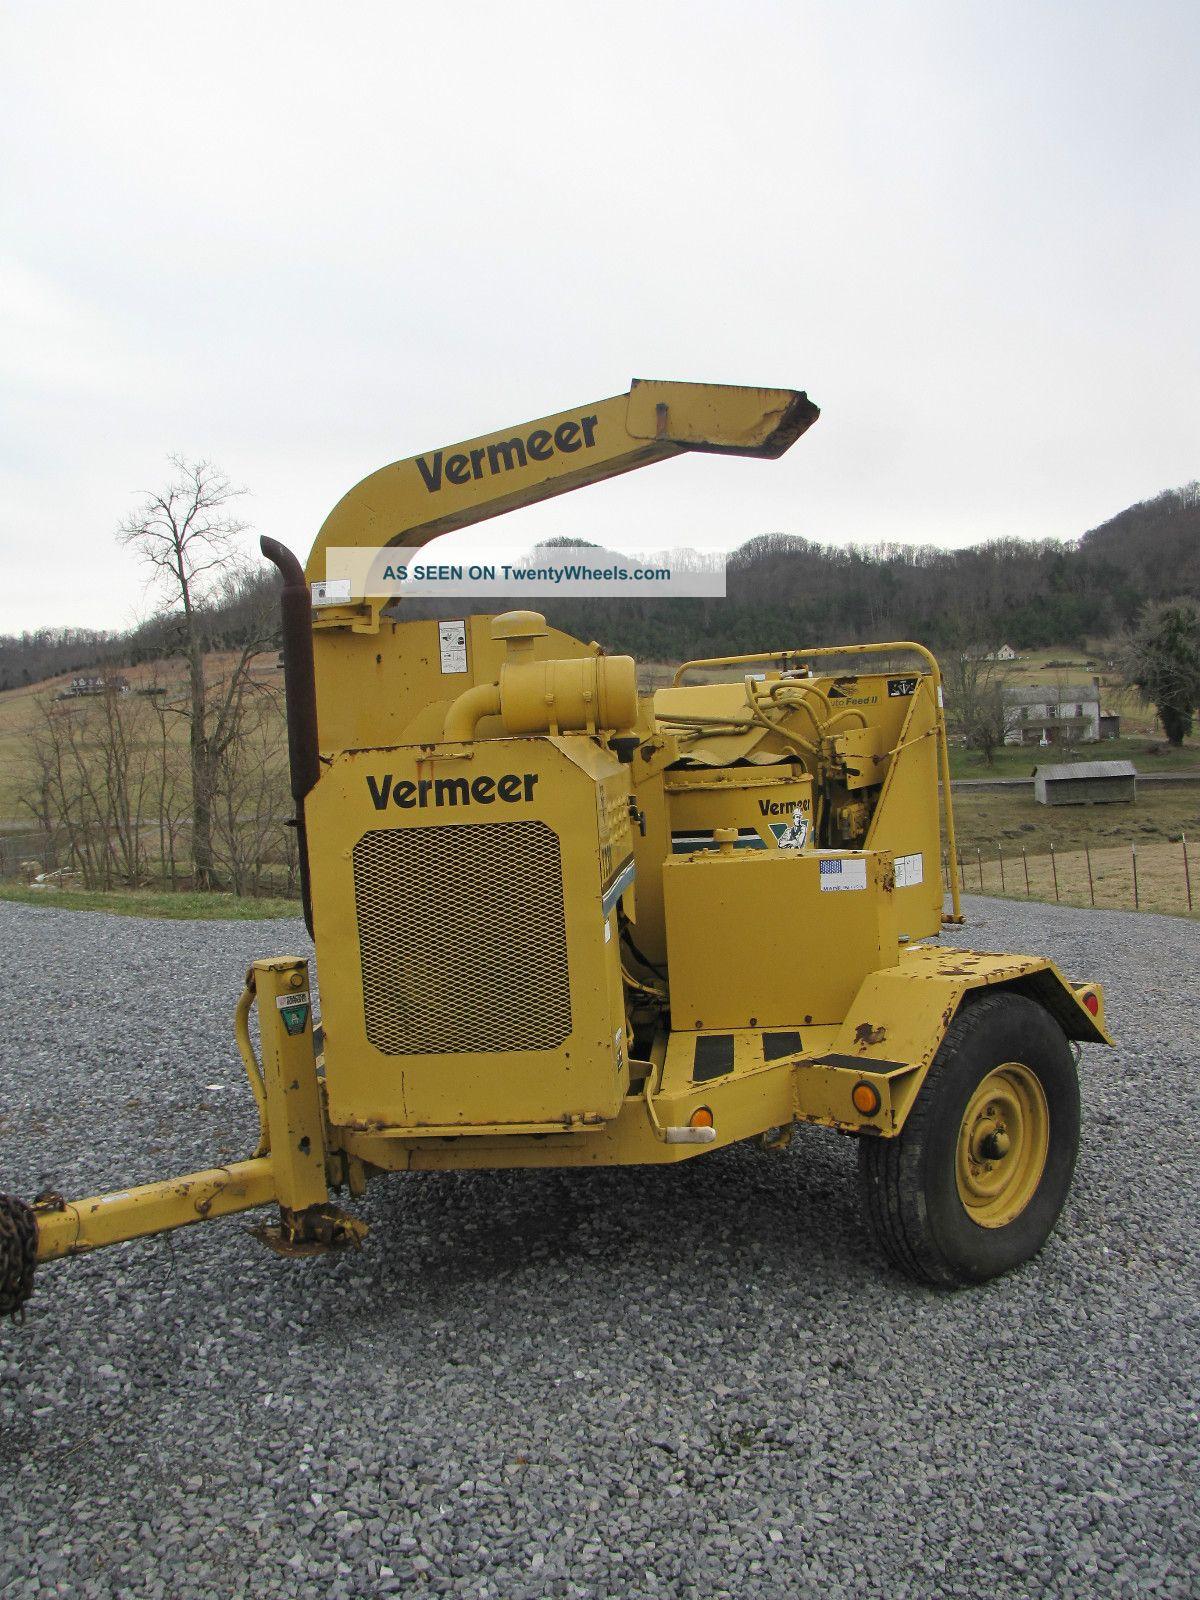 Kama Ts254c Tractor Wiring Diagram Control Vermeer Chipper Diagrams Get Free Image